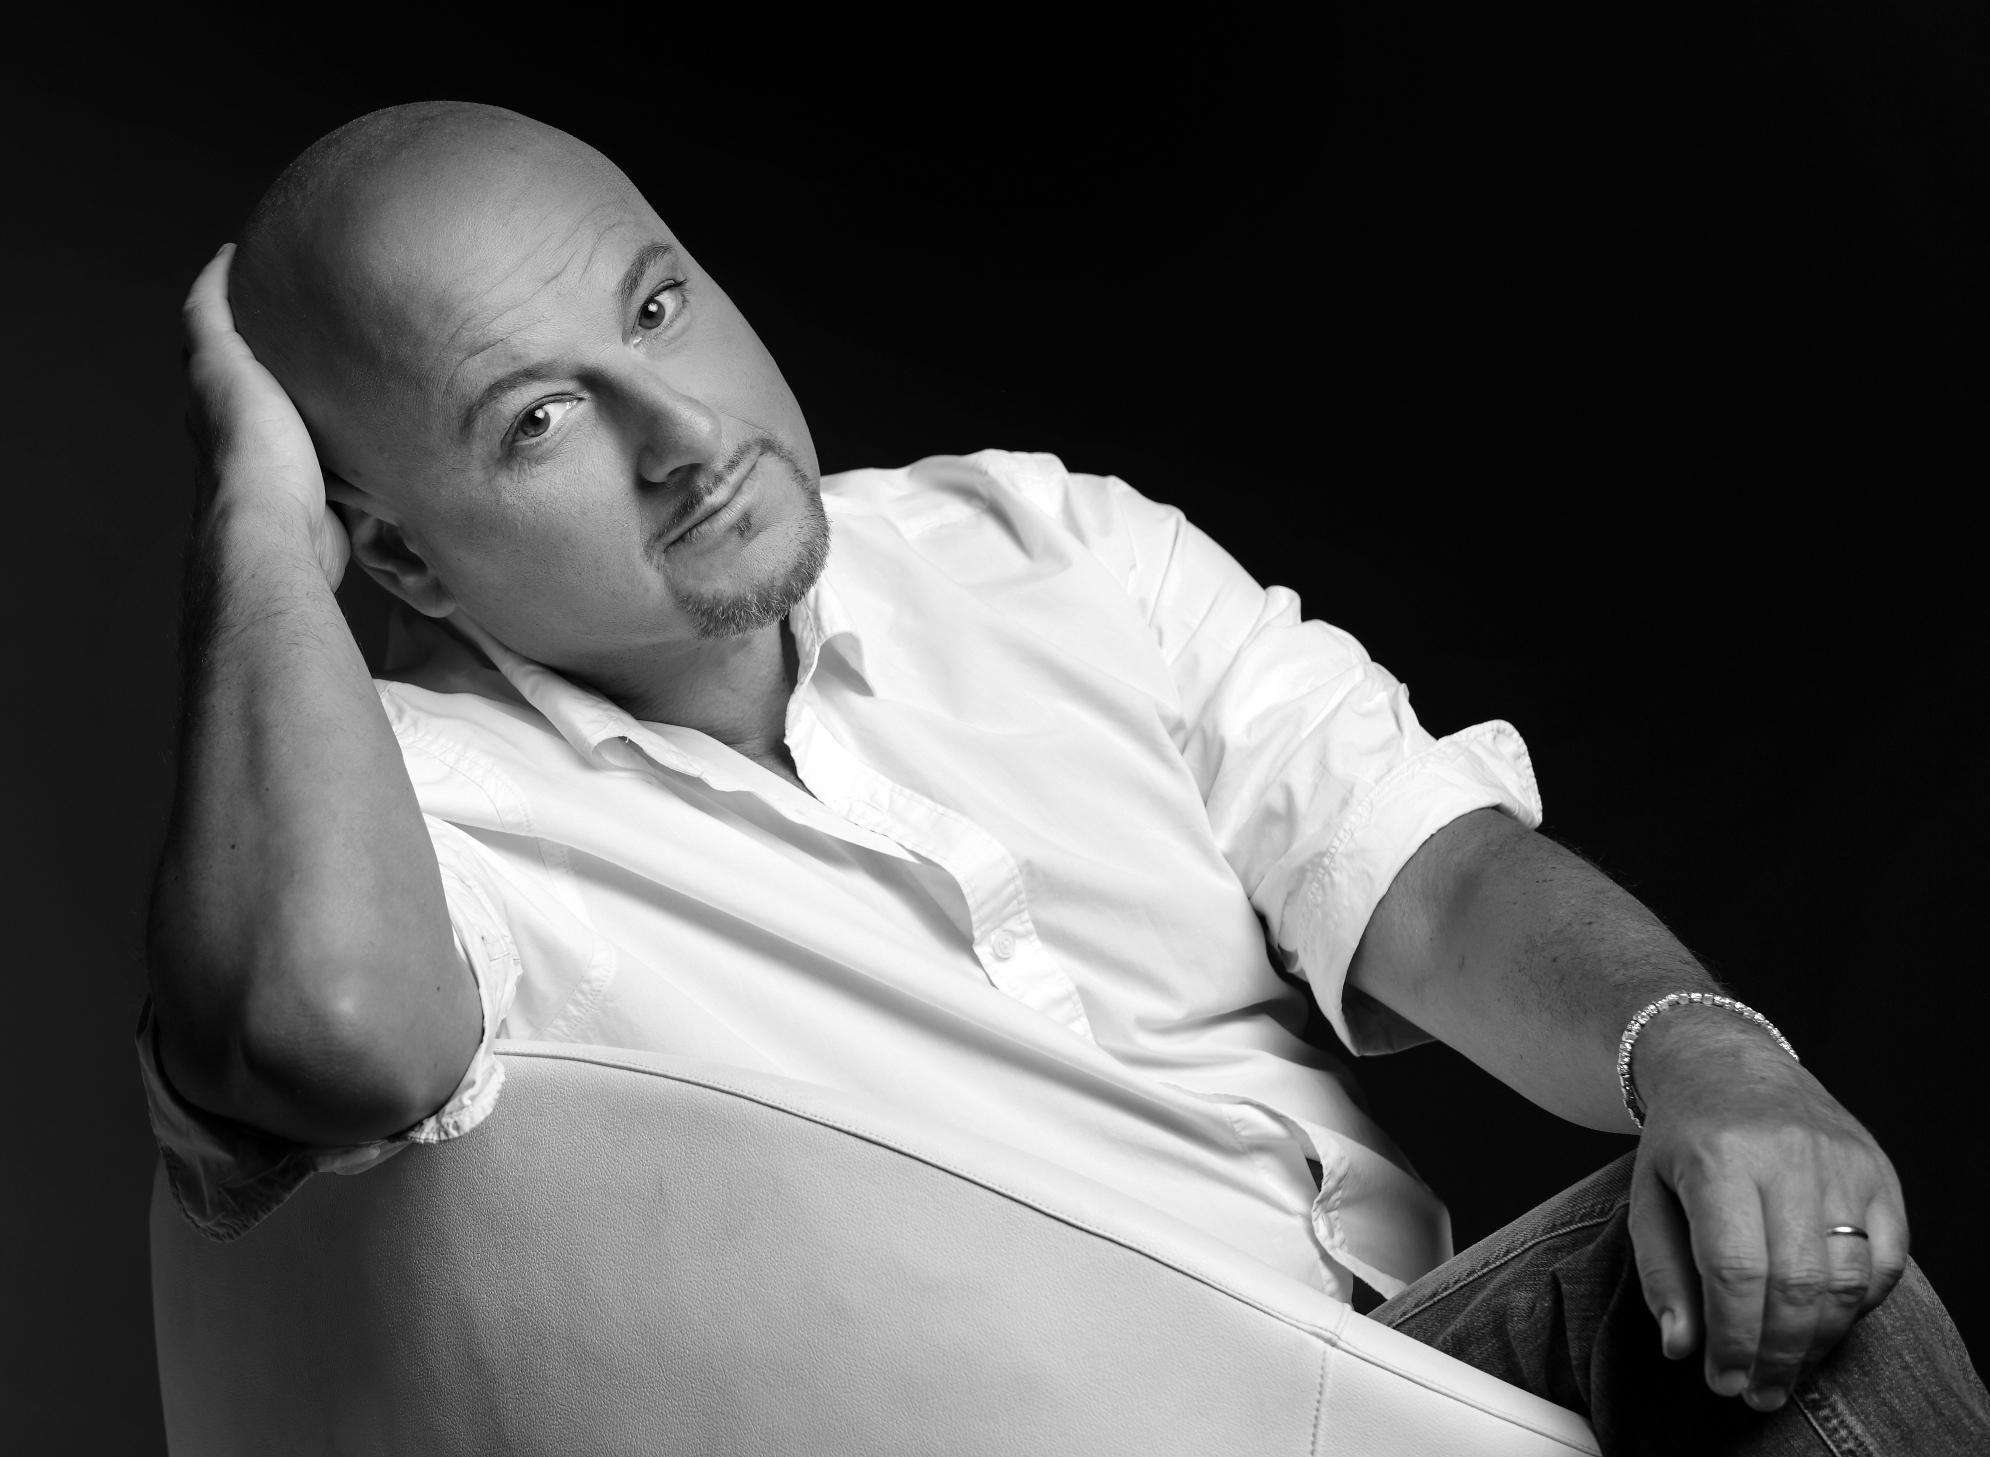 Antonino Siragusa HD